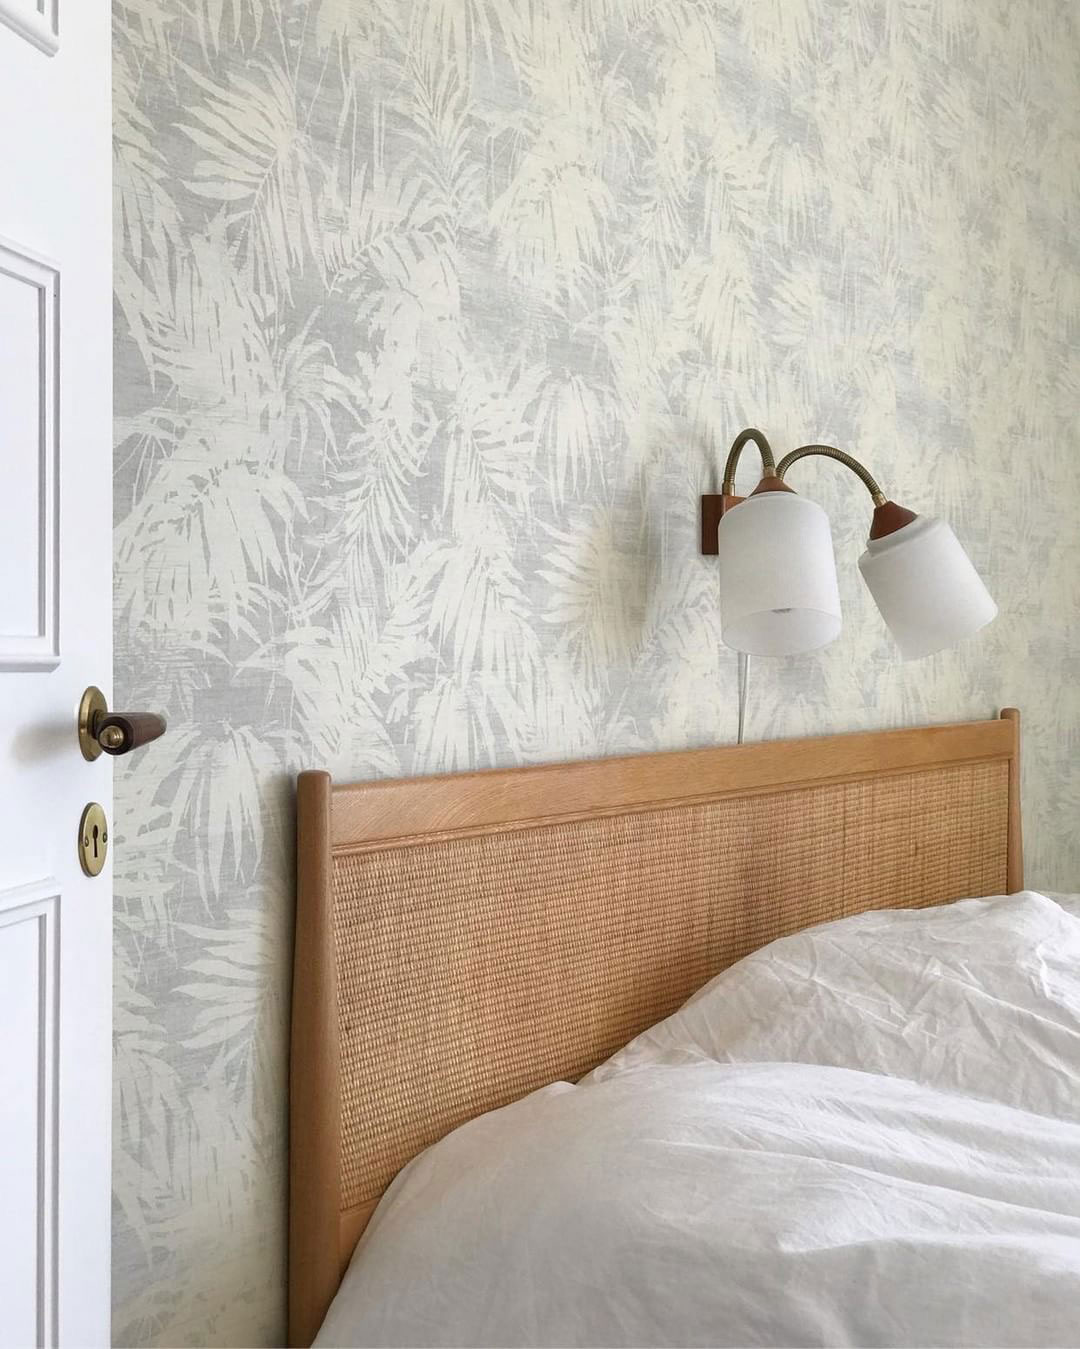 radhus-50-talet-gotland-sovrum-säng-midbec-tapeter